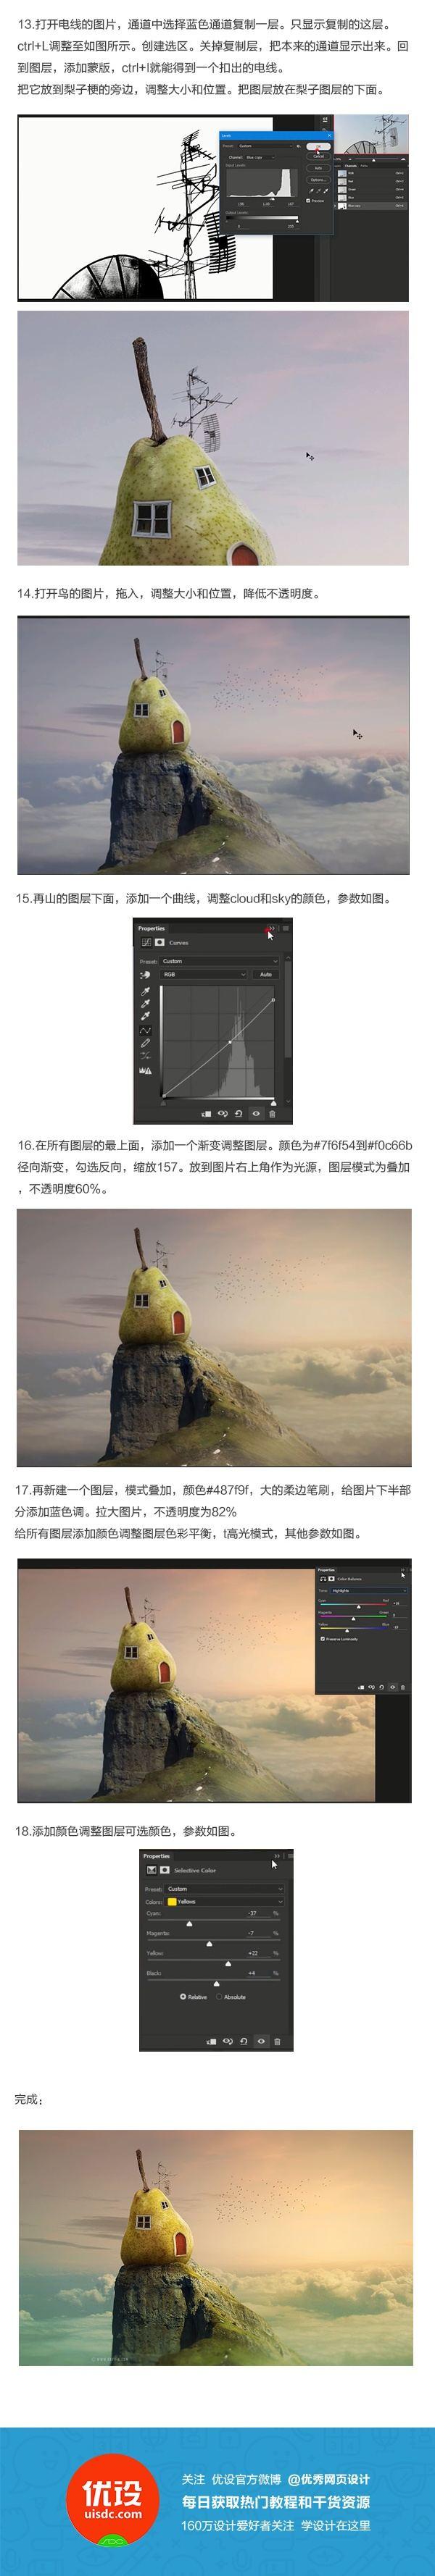 Photoshop創意合成建立在懸崖上的鴨梨房屋